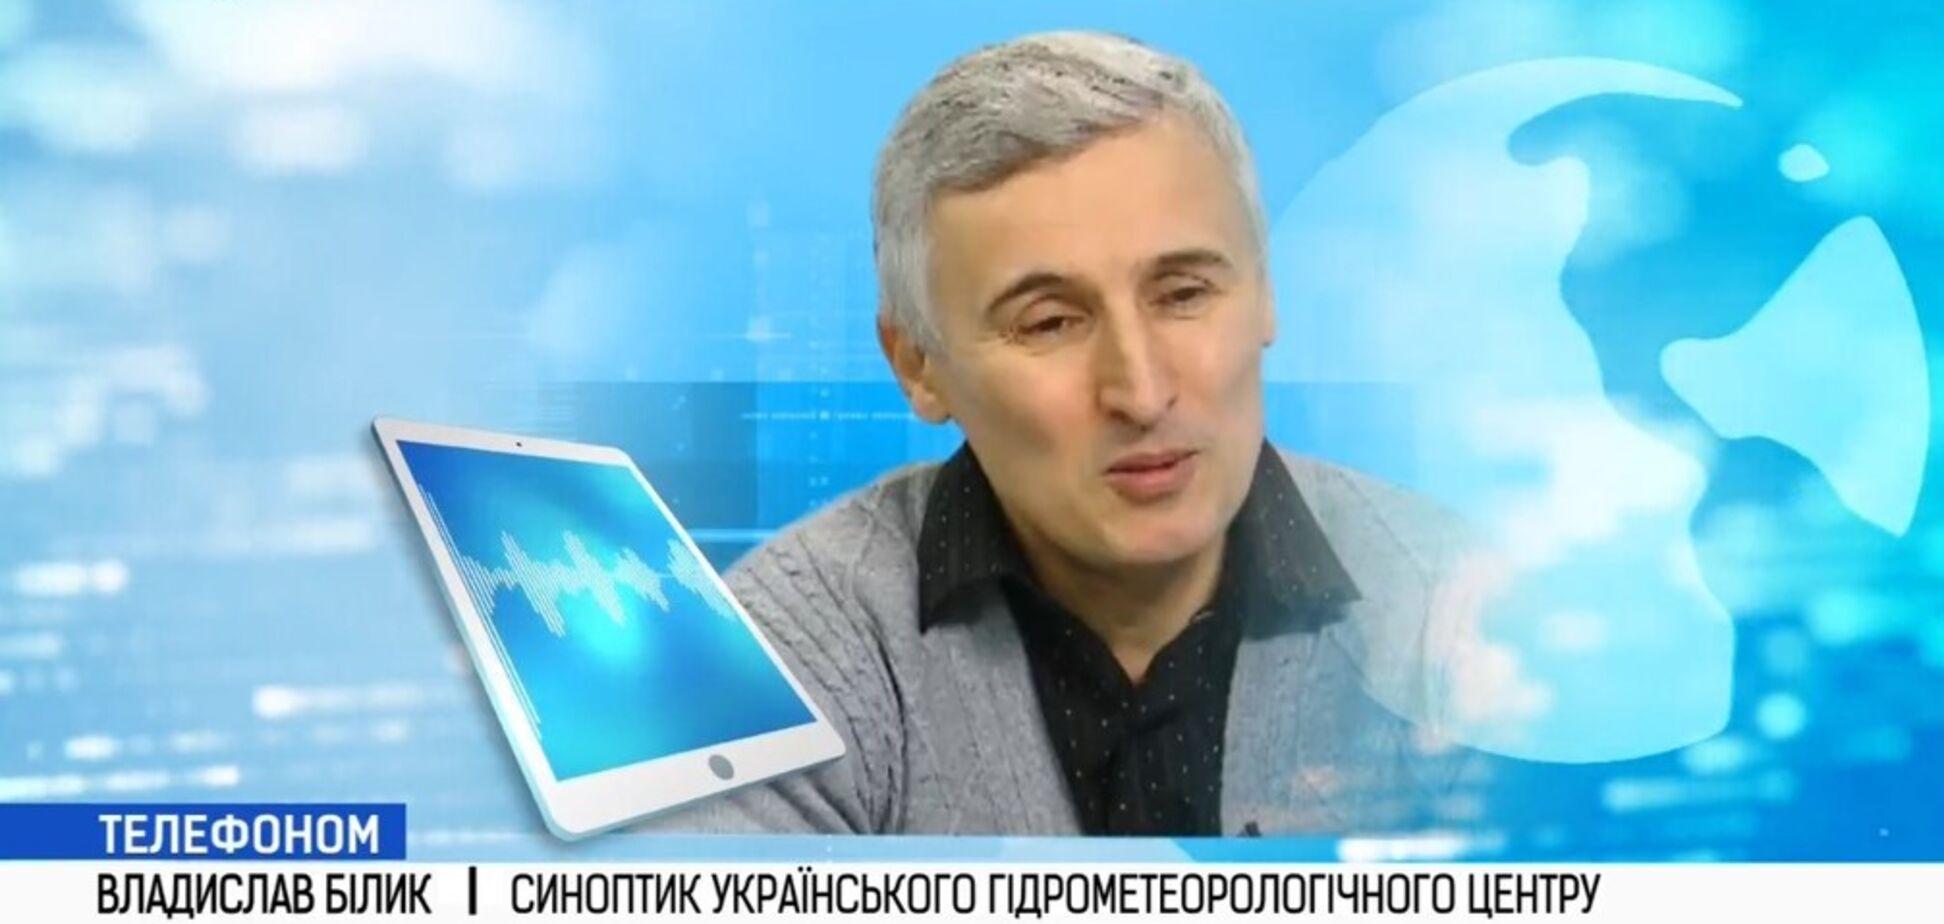 Рождество без снега: синоптики изменили прогноз на праздники в Украине